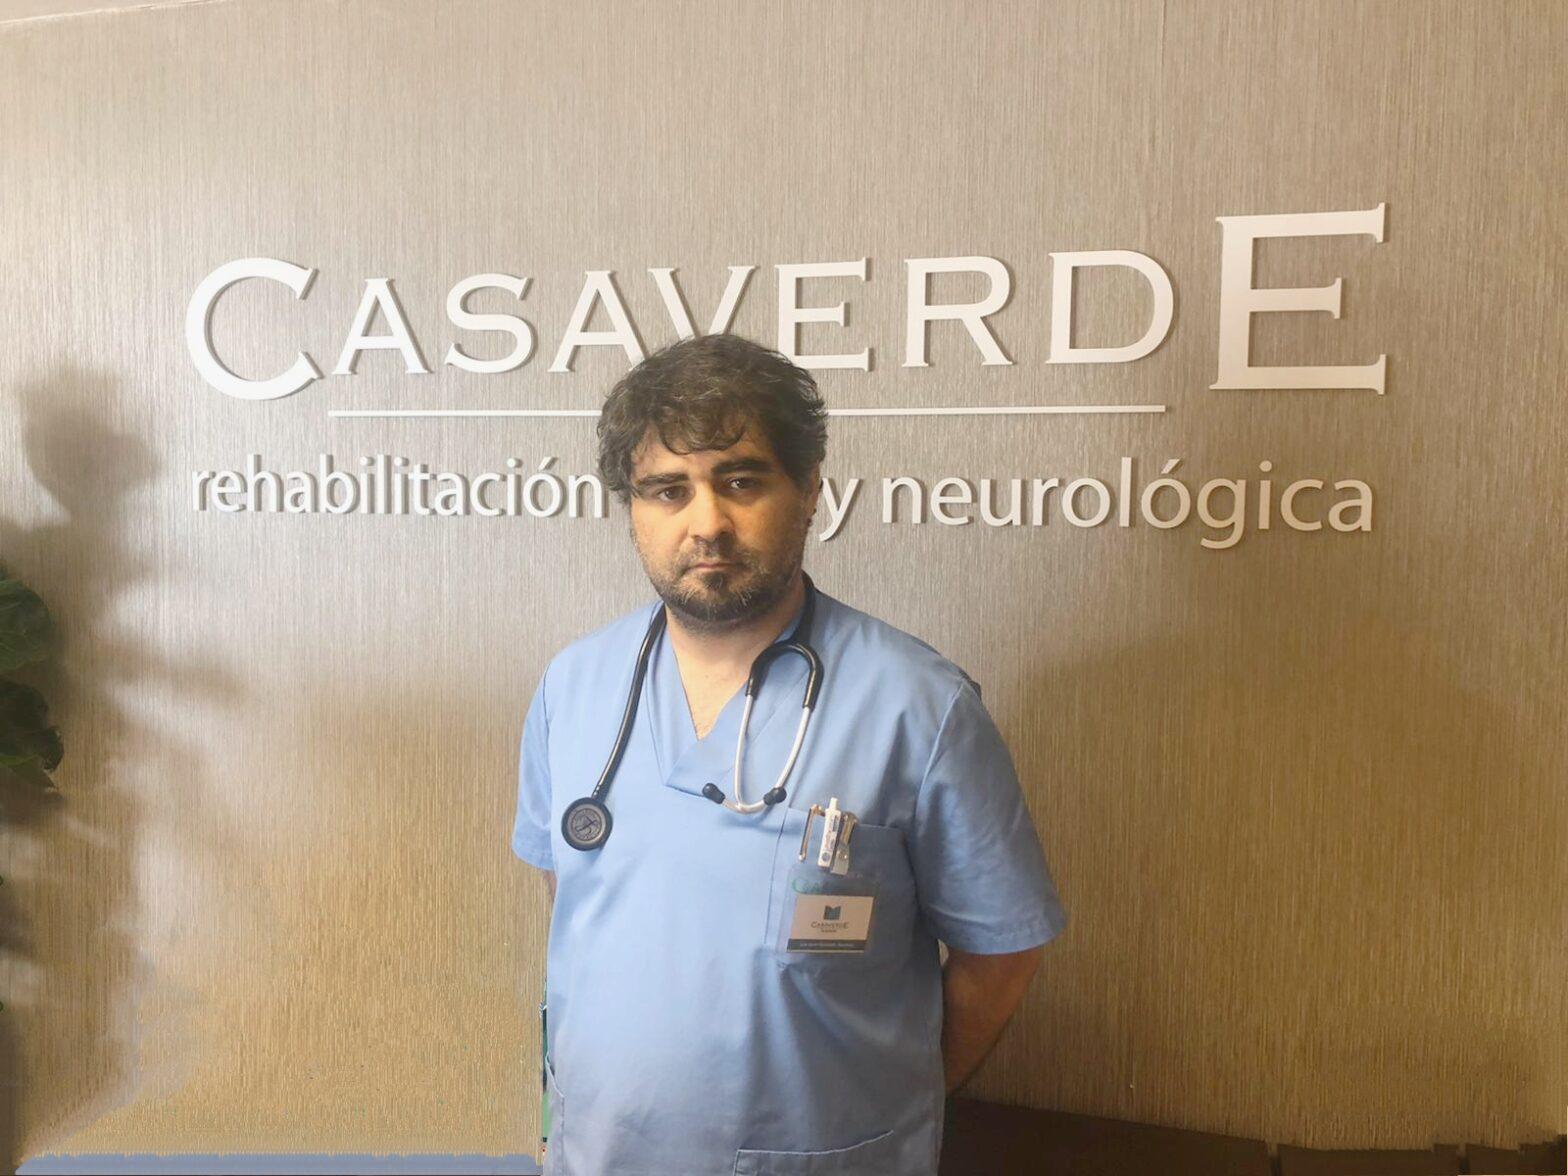 Jose Neurologo Casaverde 1568x1176